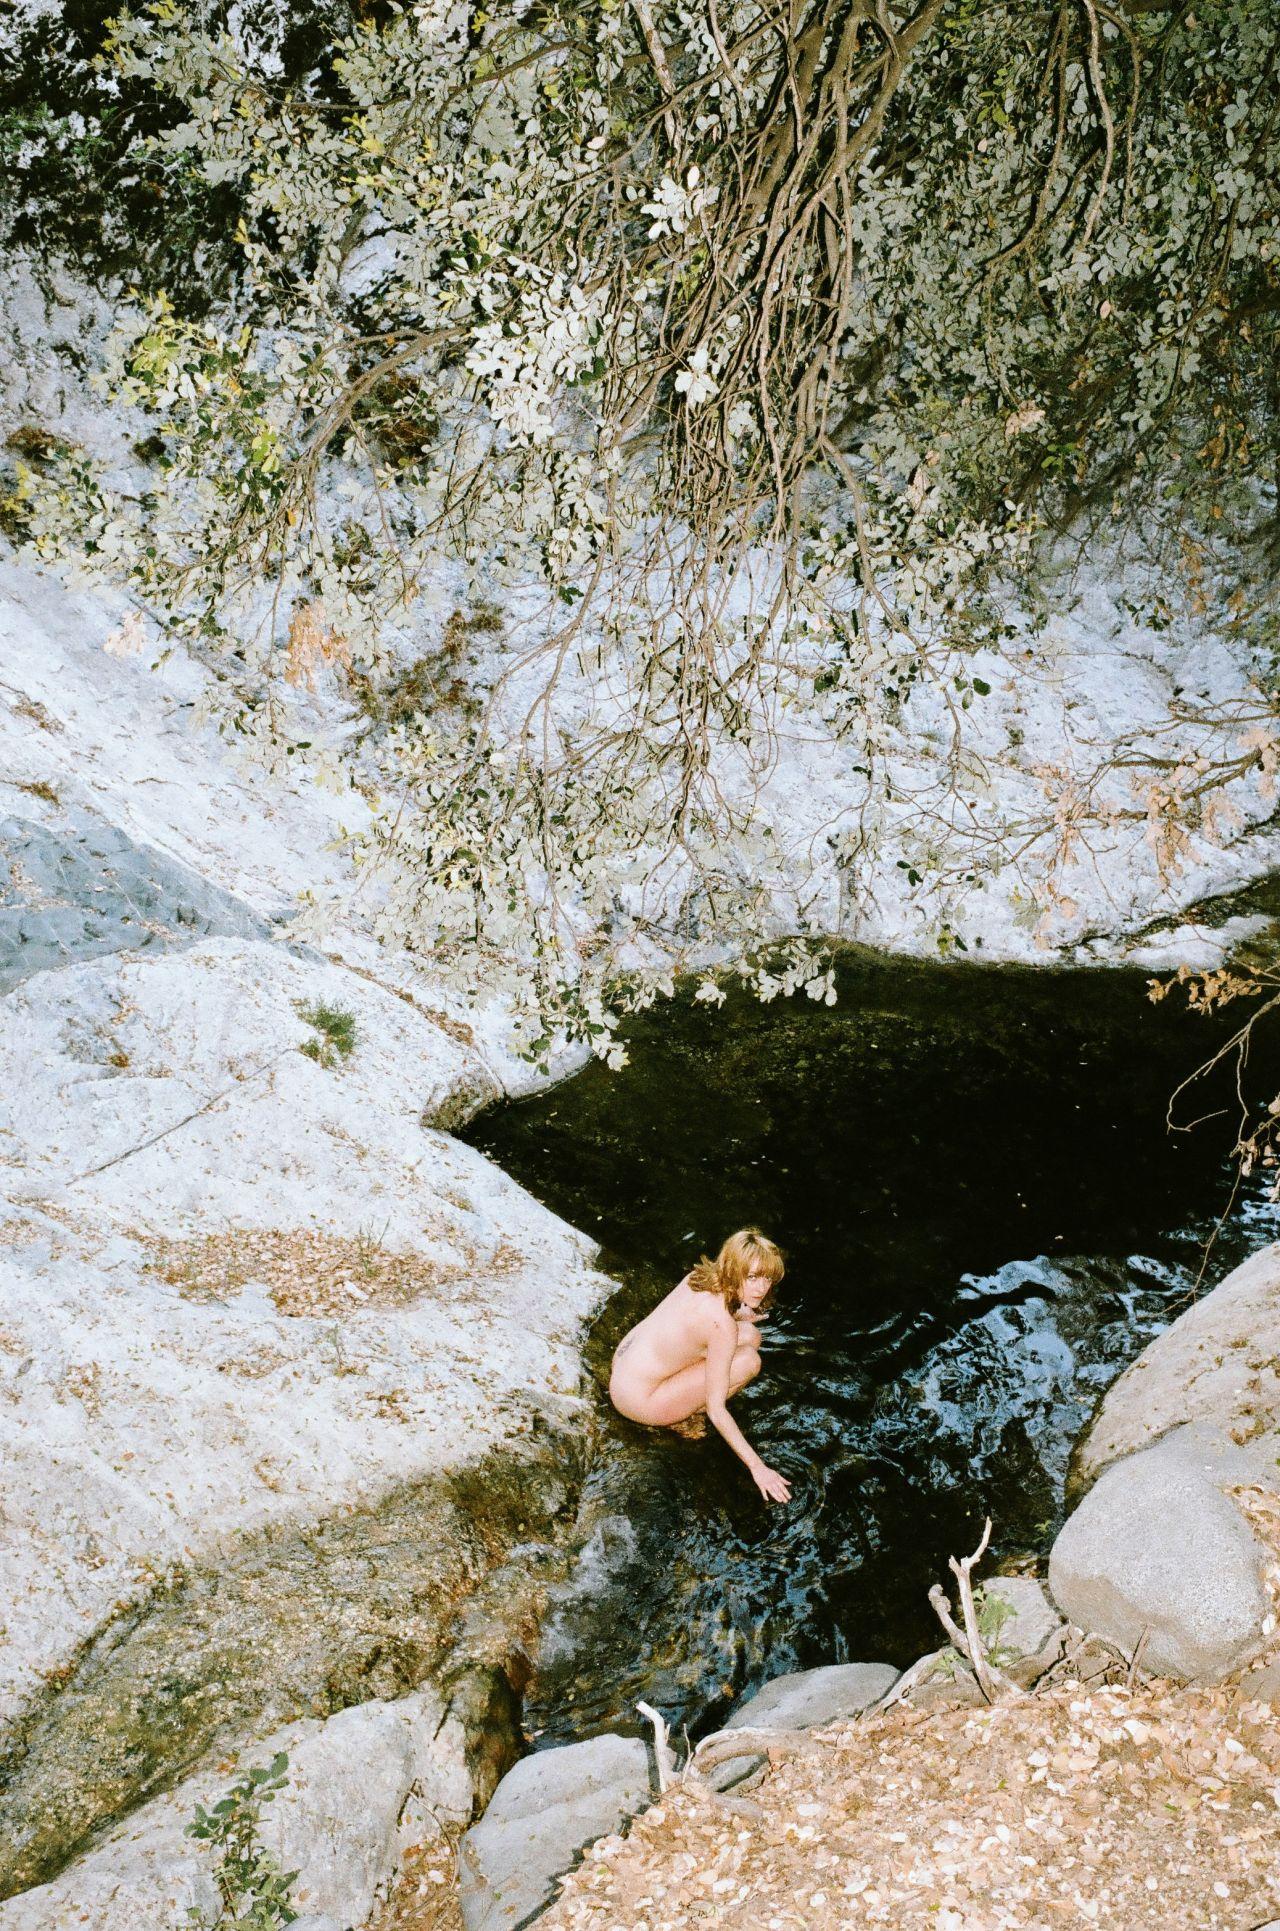 Emma Stone Vanity Fair Photoshoot Jena Malone - Photosho...